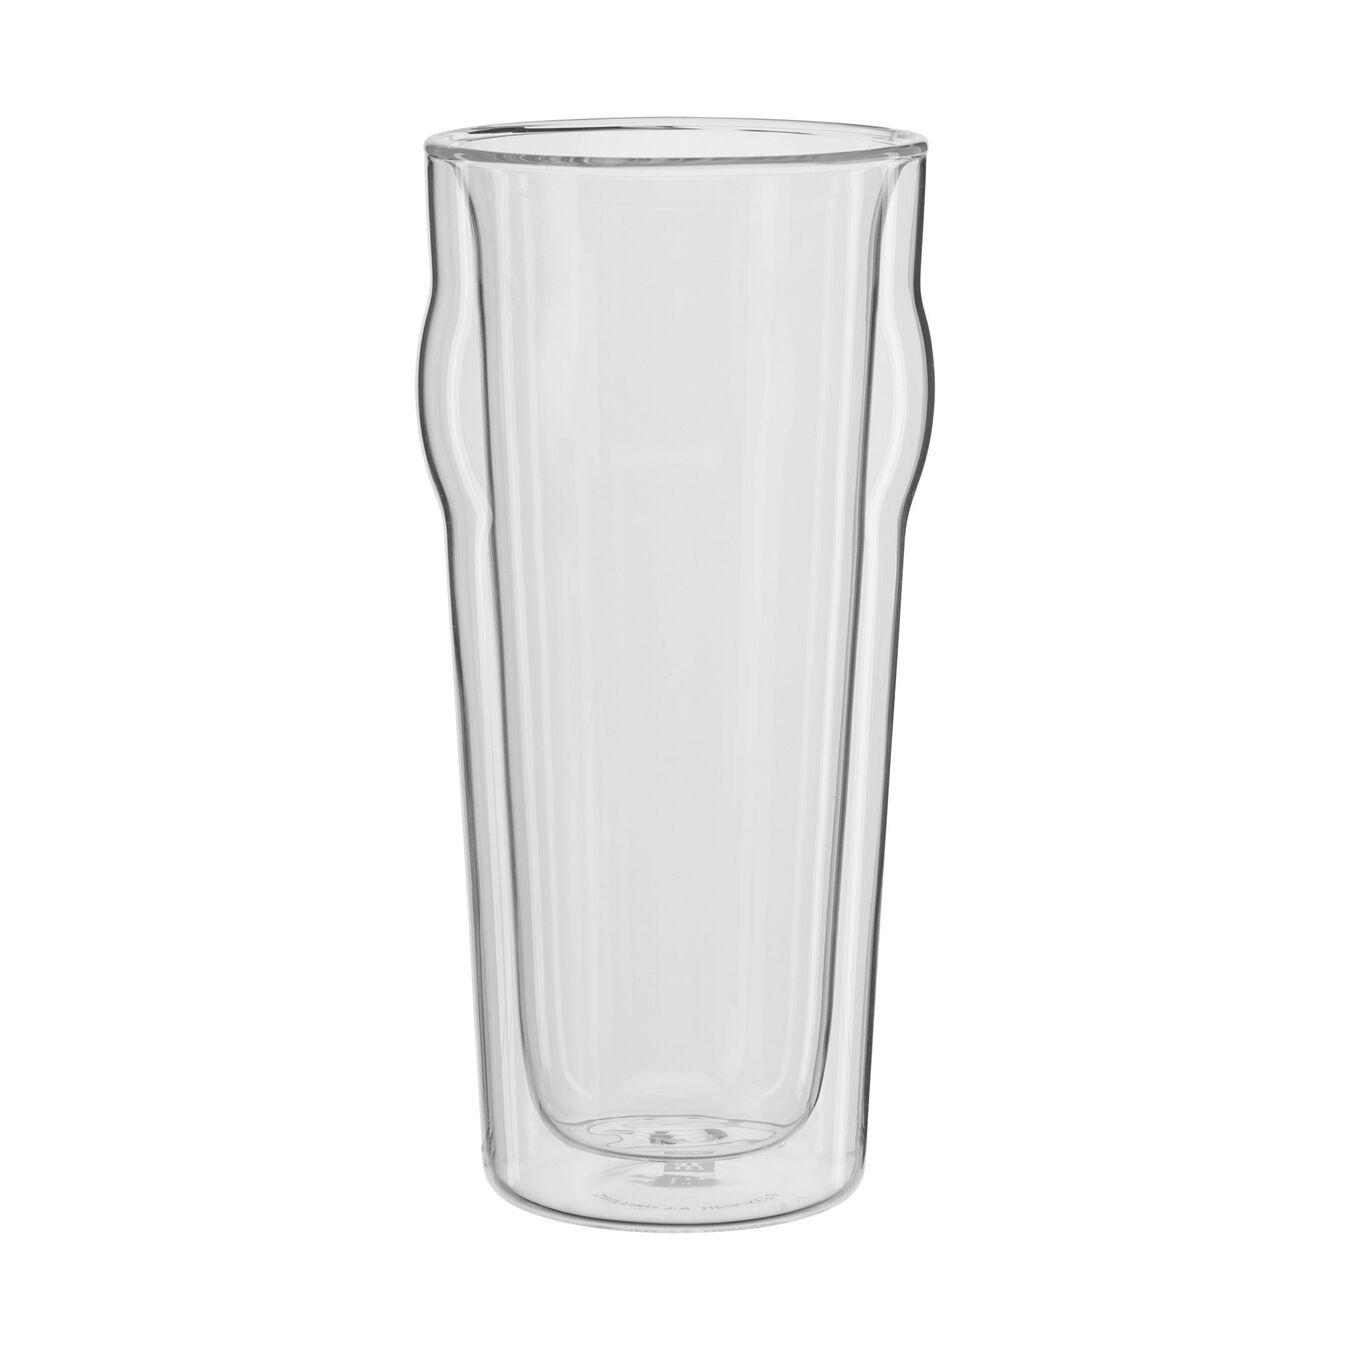 4 Piece Beer glass set,,large 3